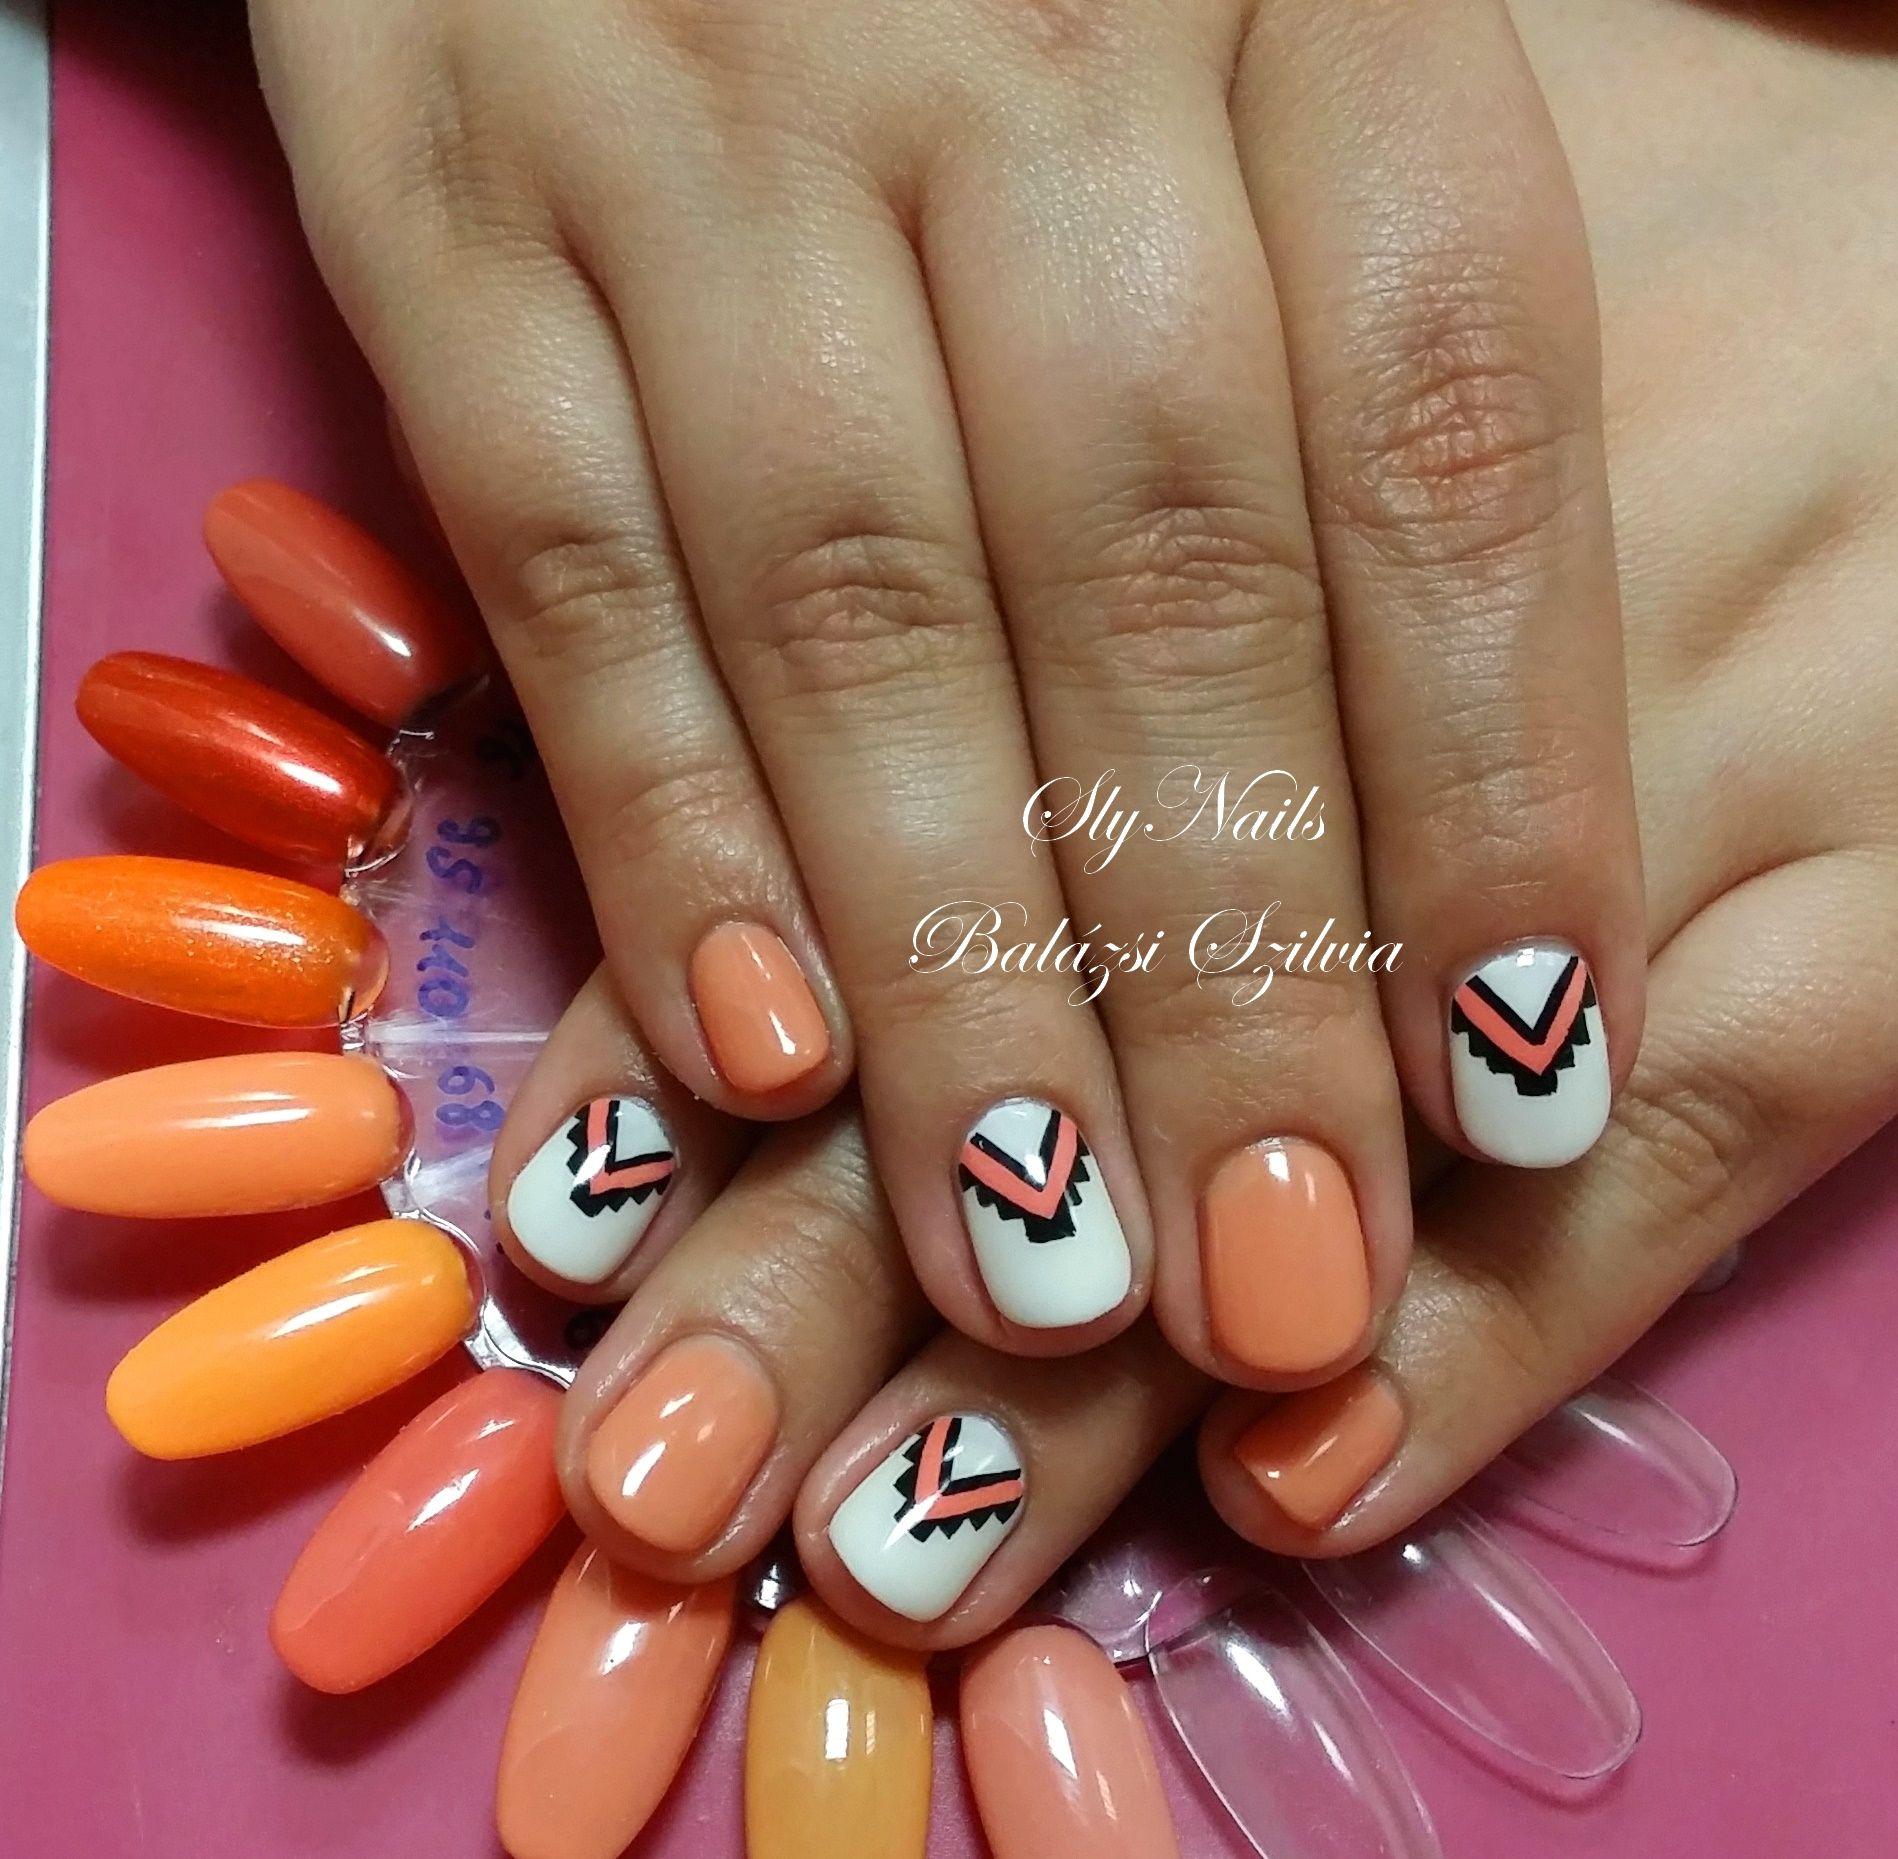 Divatos Gel Lakk Nail Designs Nails Convenience Store Products